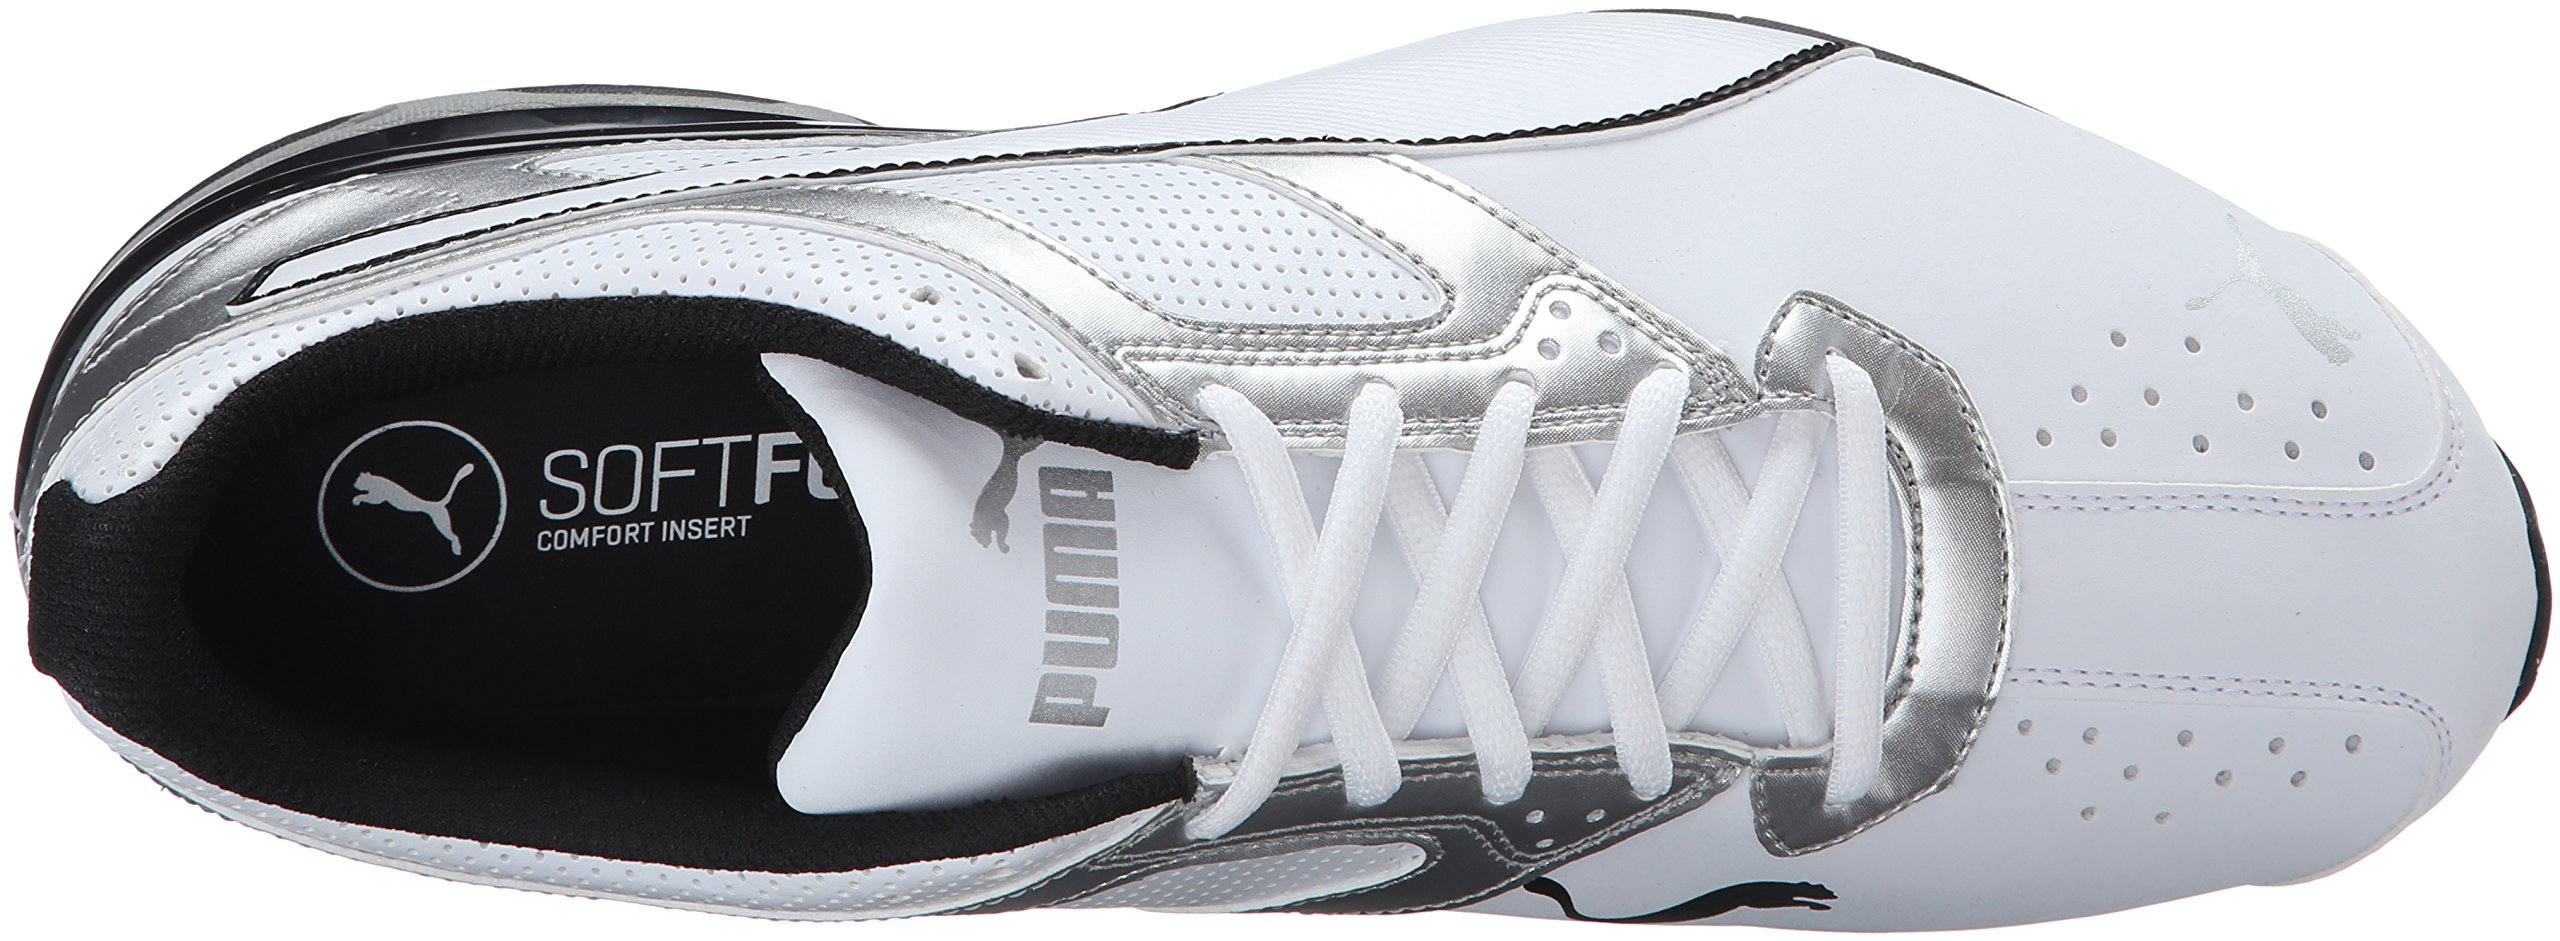 PUMA Men's Tazon 6 FM Puma White/ Puma Silver Running Shoe - 7.5 D(M) US by PUMA (Image #8)